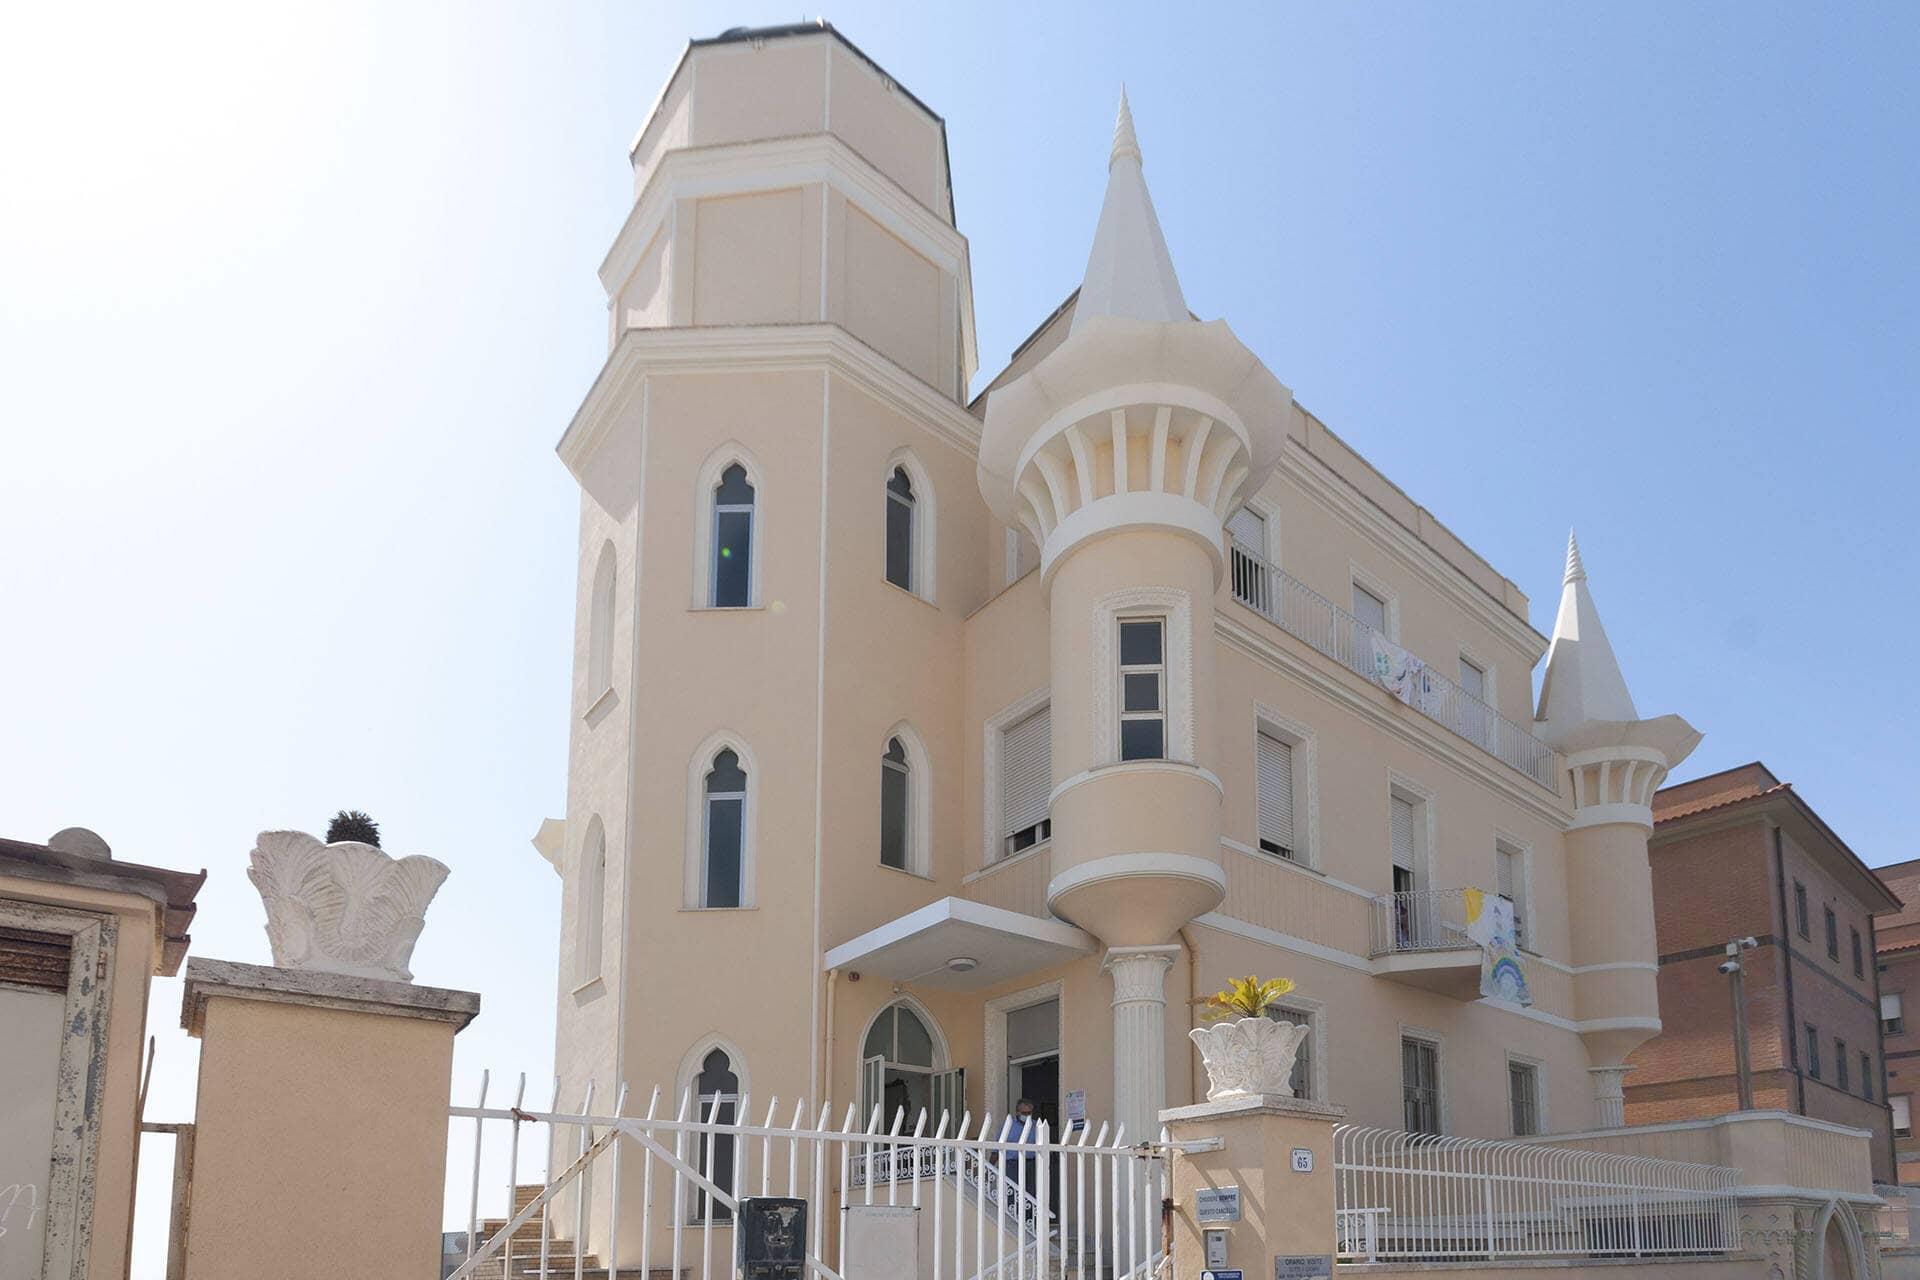 RSA Casa degli Angeli Custodi - Location